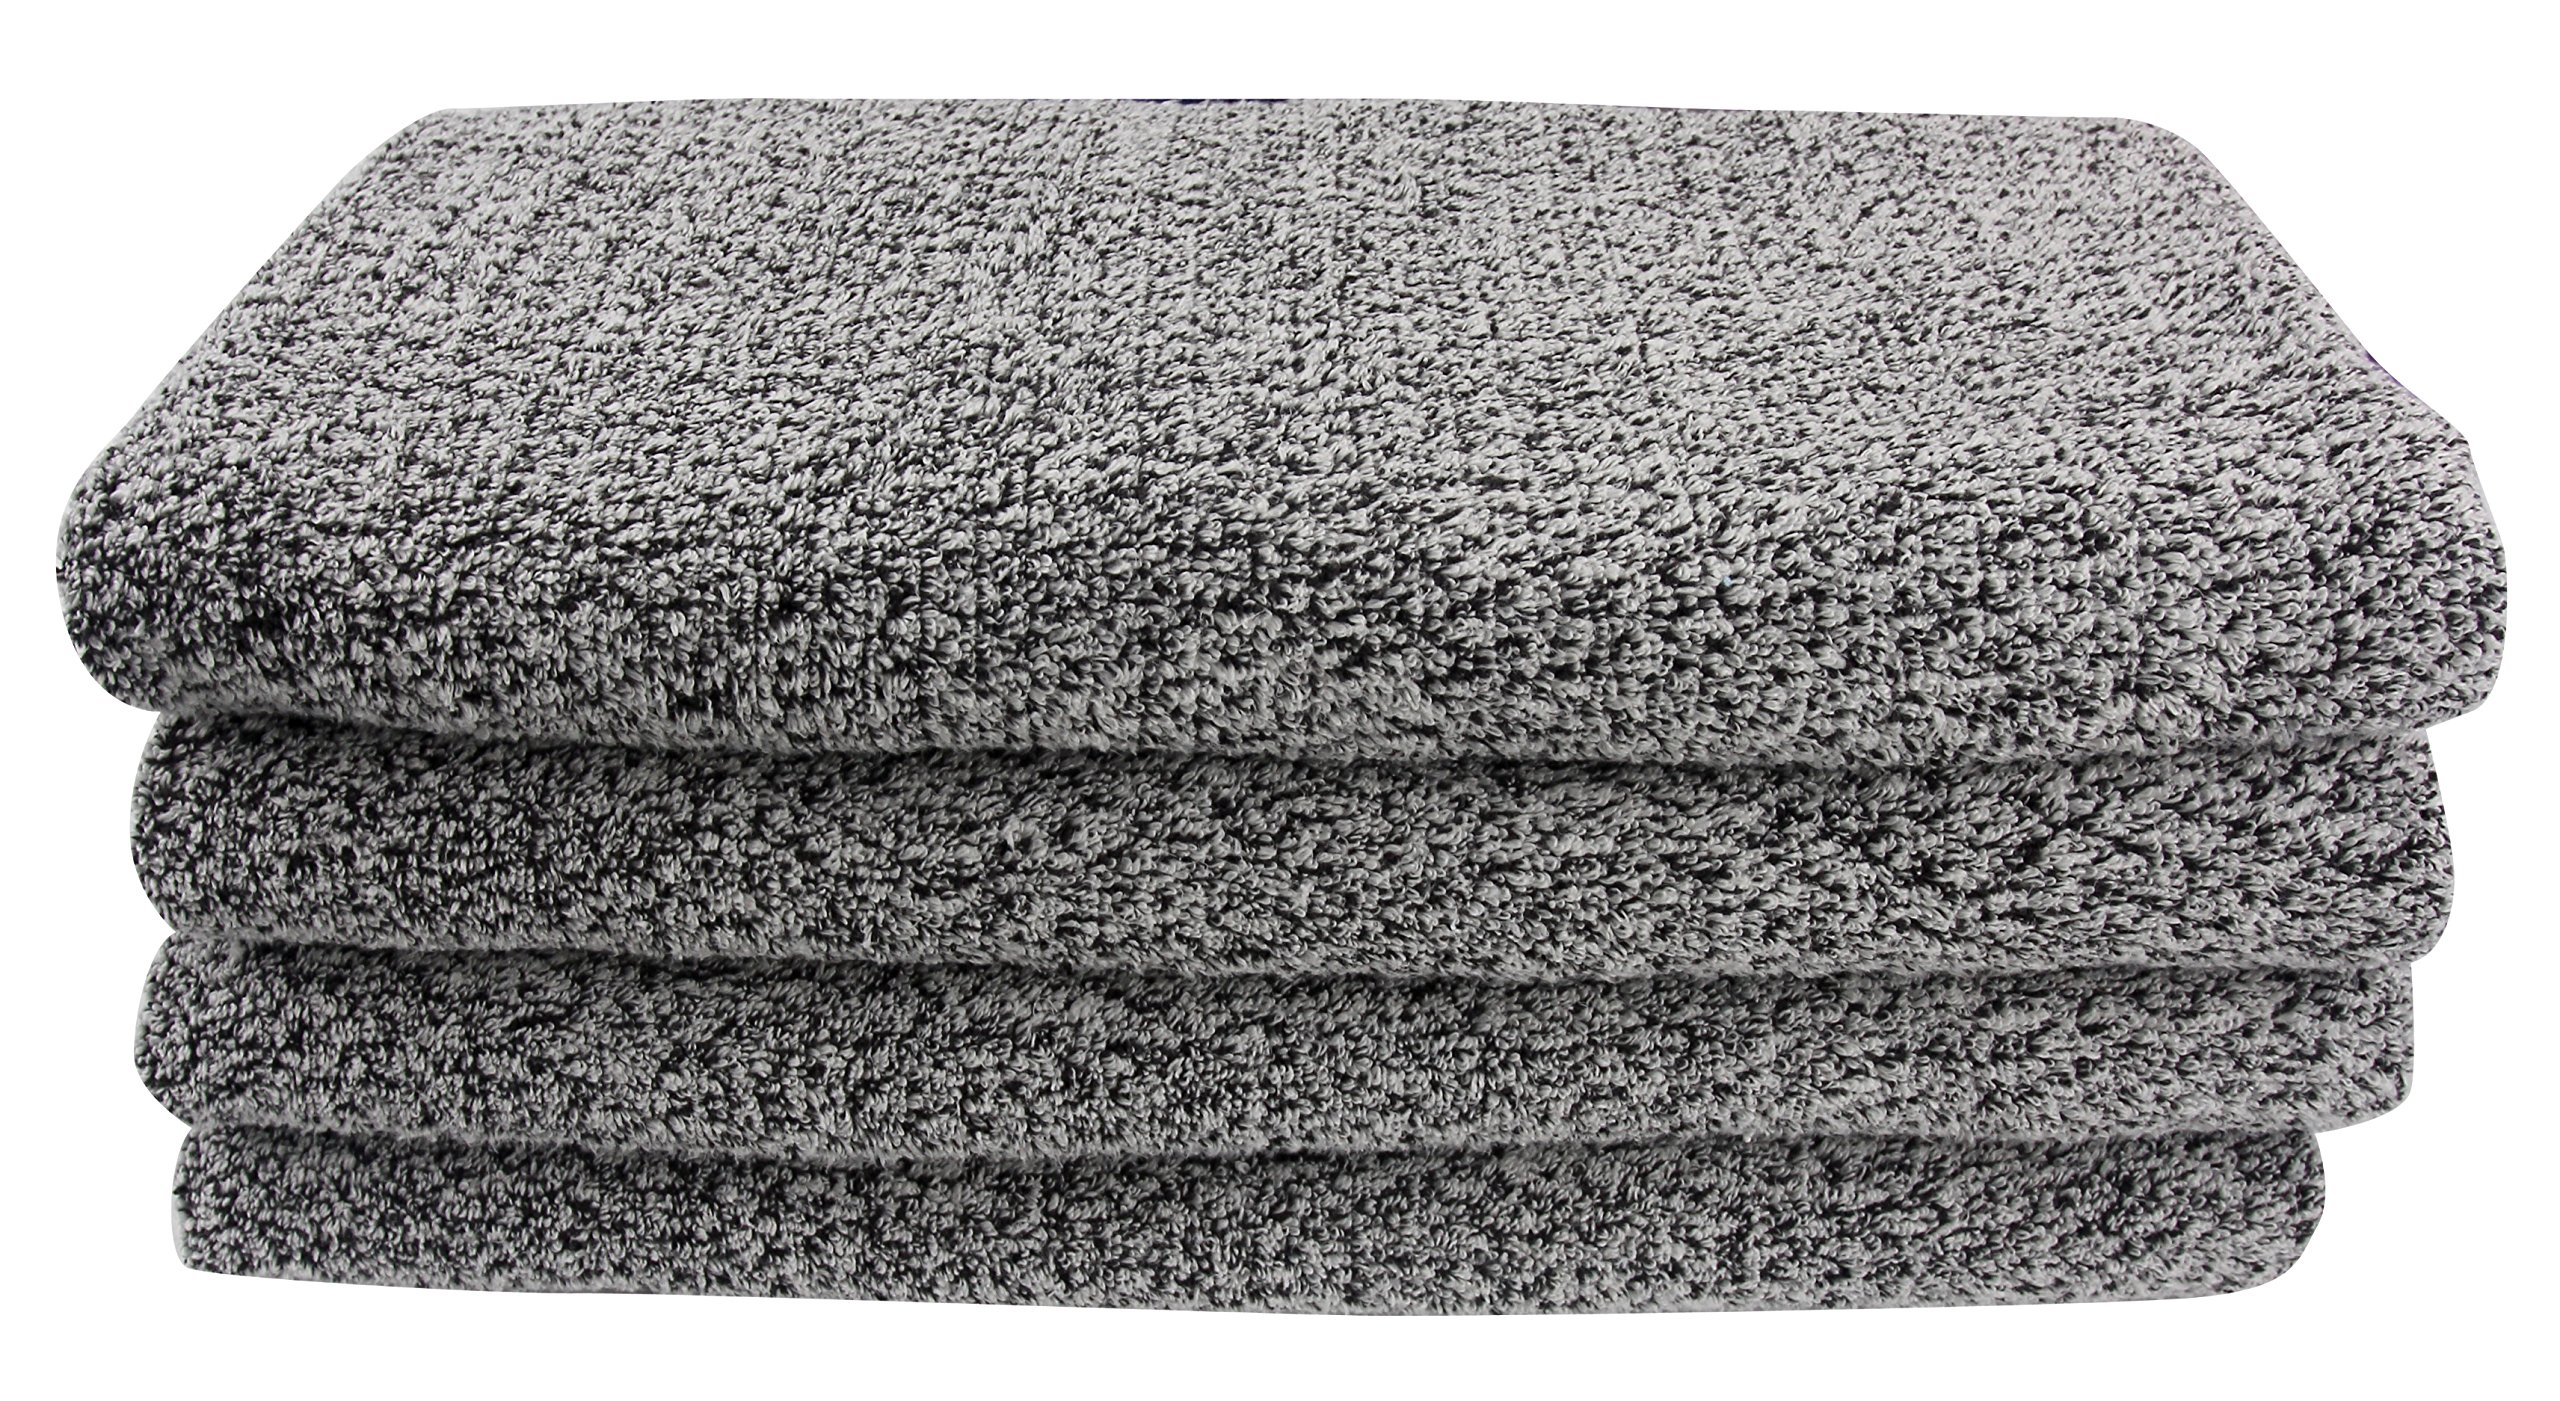 Everplush Diamond Jacquard Bath Sheet 2 Pack in Grey